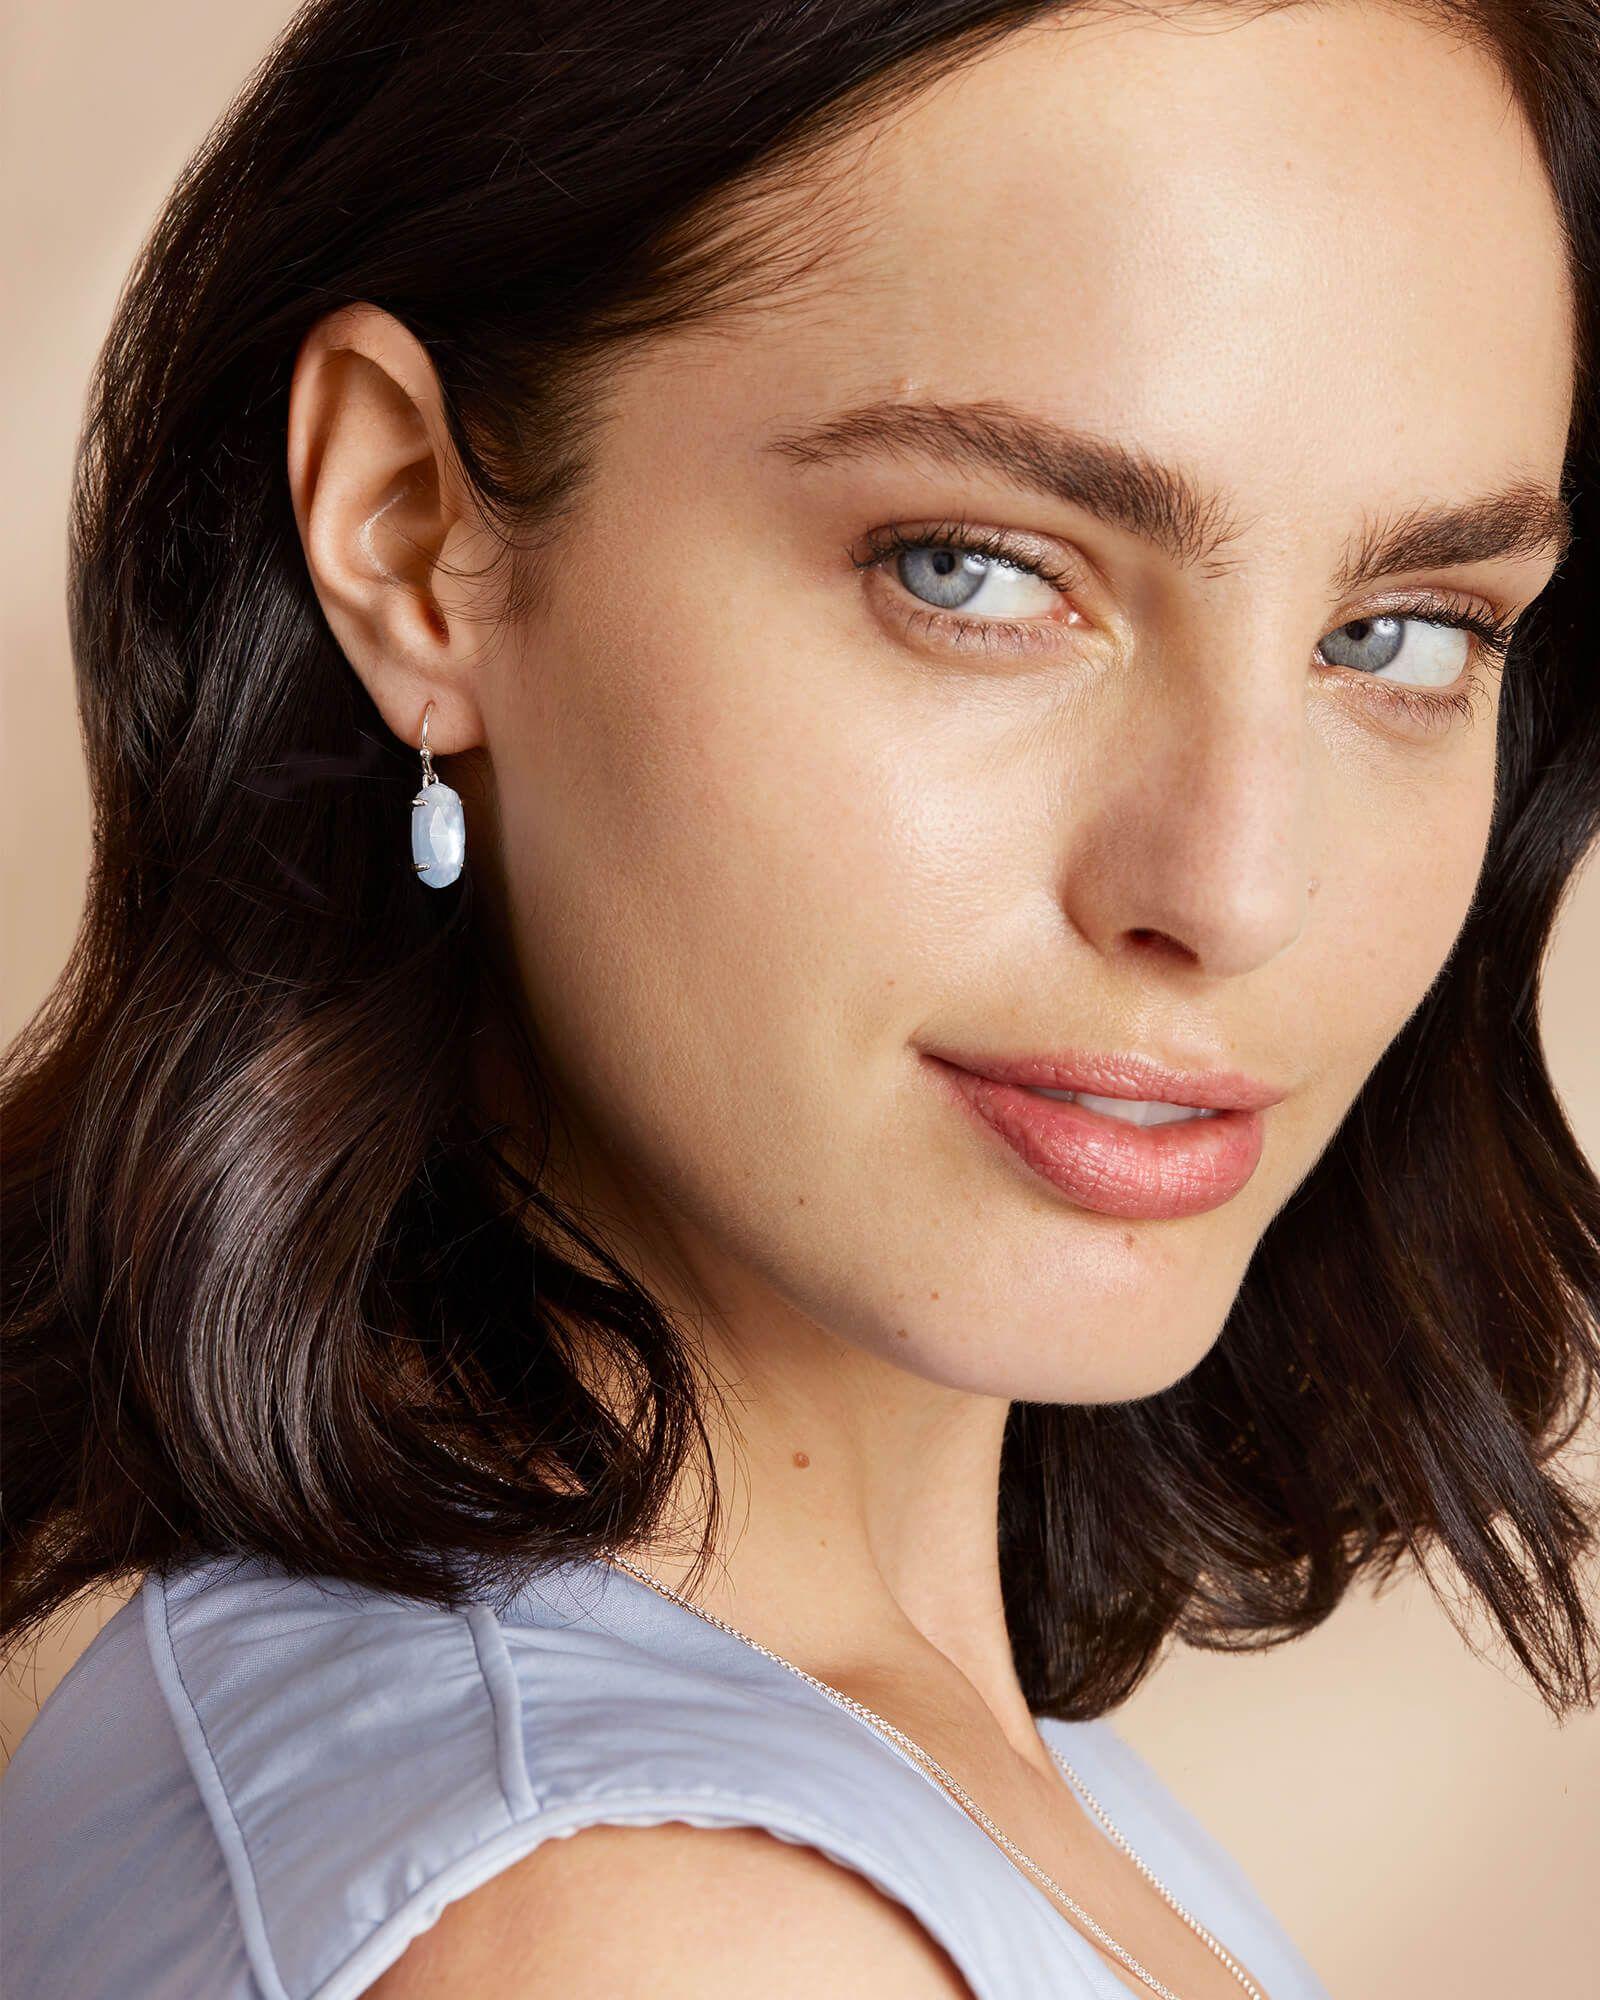 d09a1ab25 Lemmi Bright Silver Drop Earrings in Sky Blue Illusion   Kendra Scott